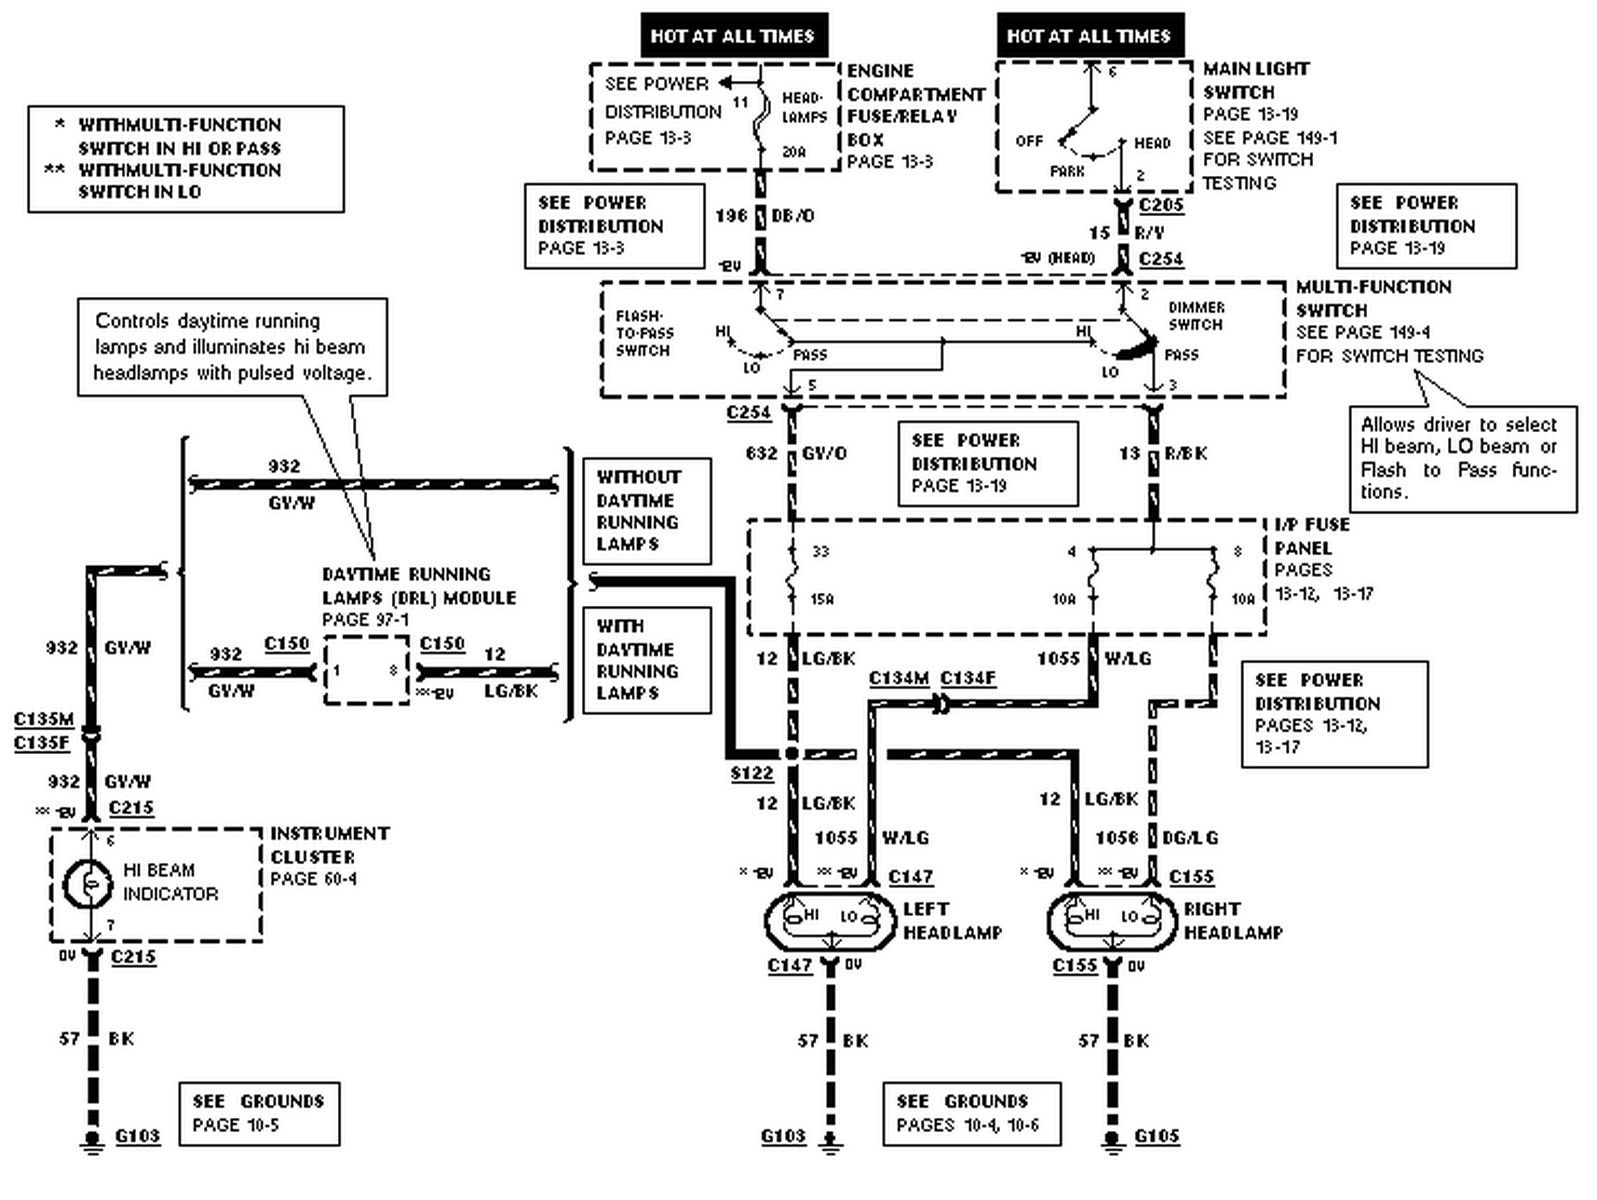 Ford Mondeo Mk3 Heated Seat Wiring Diagram  Somurich